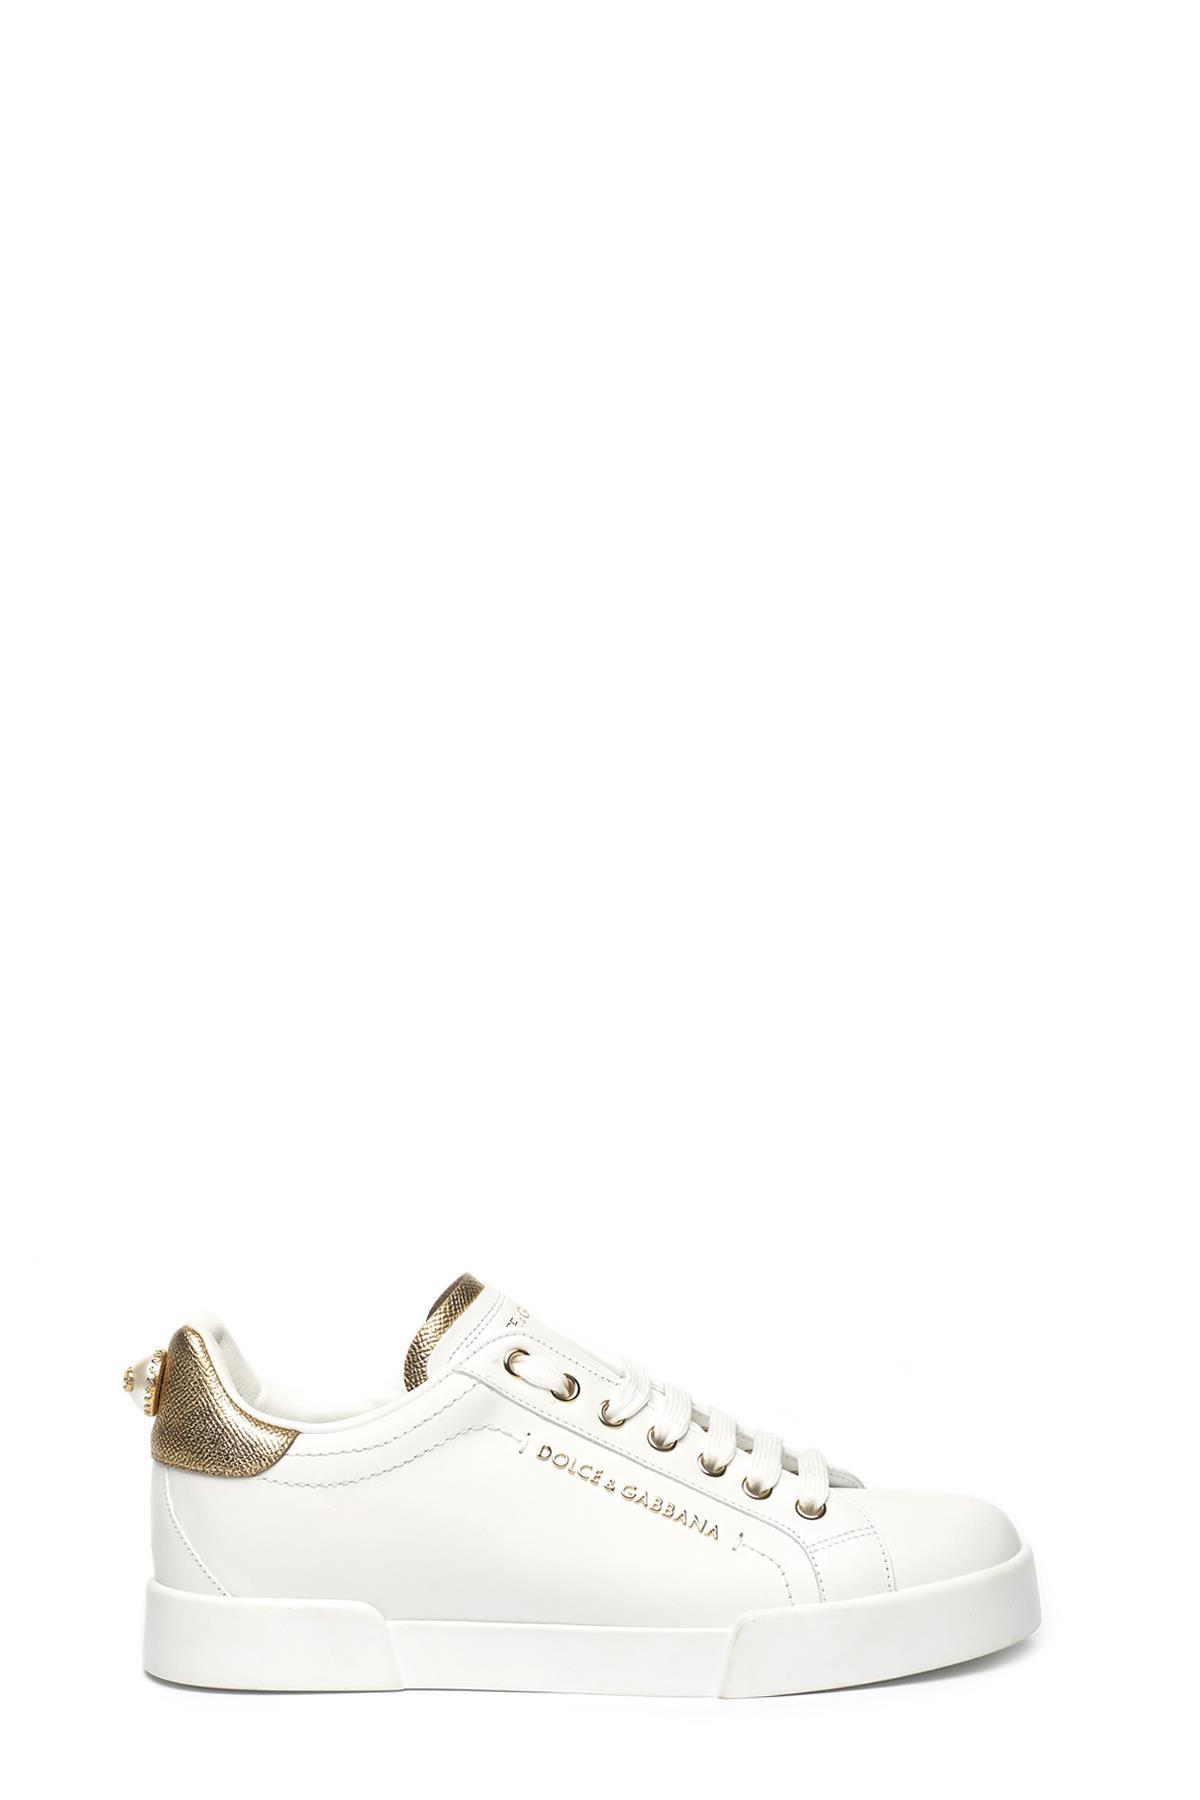 dolce \u0026 gabbana 'Portofino' sneakers